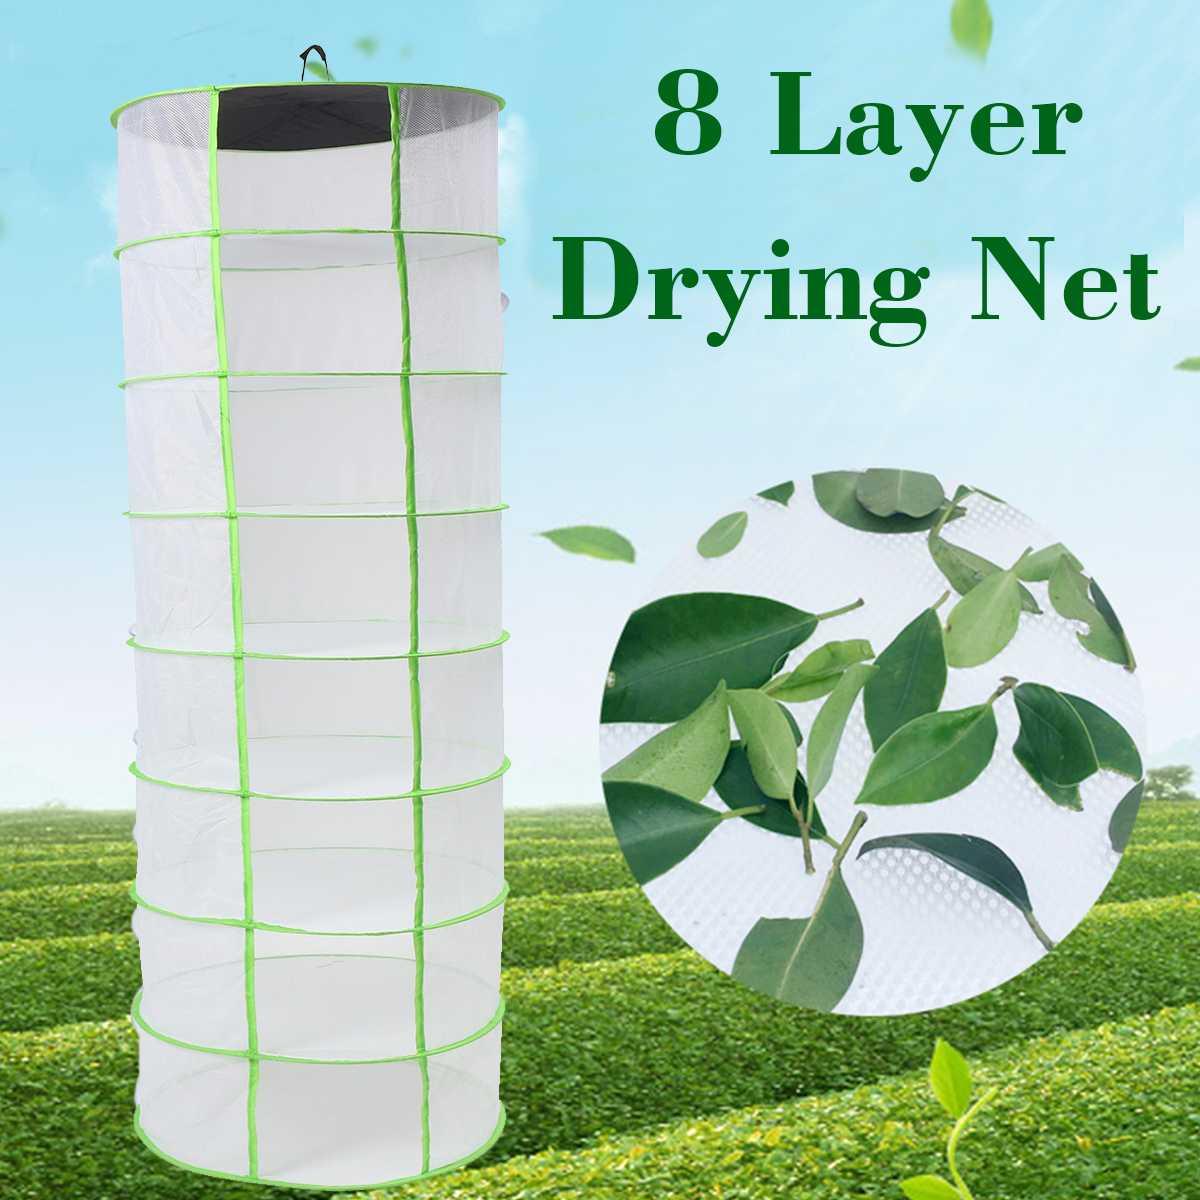 Herb Drying Rack Net 3 Layer Herb Dryer Mesh Hanging Dryer Racks With Zipper